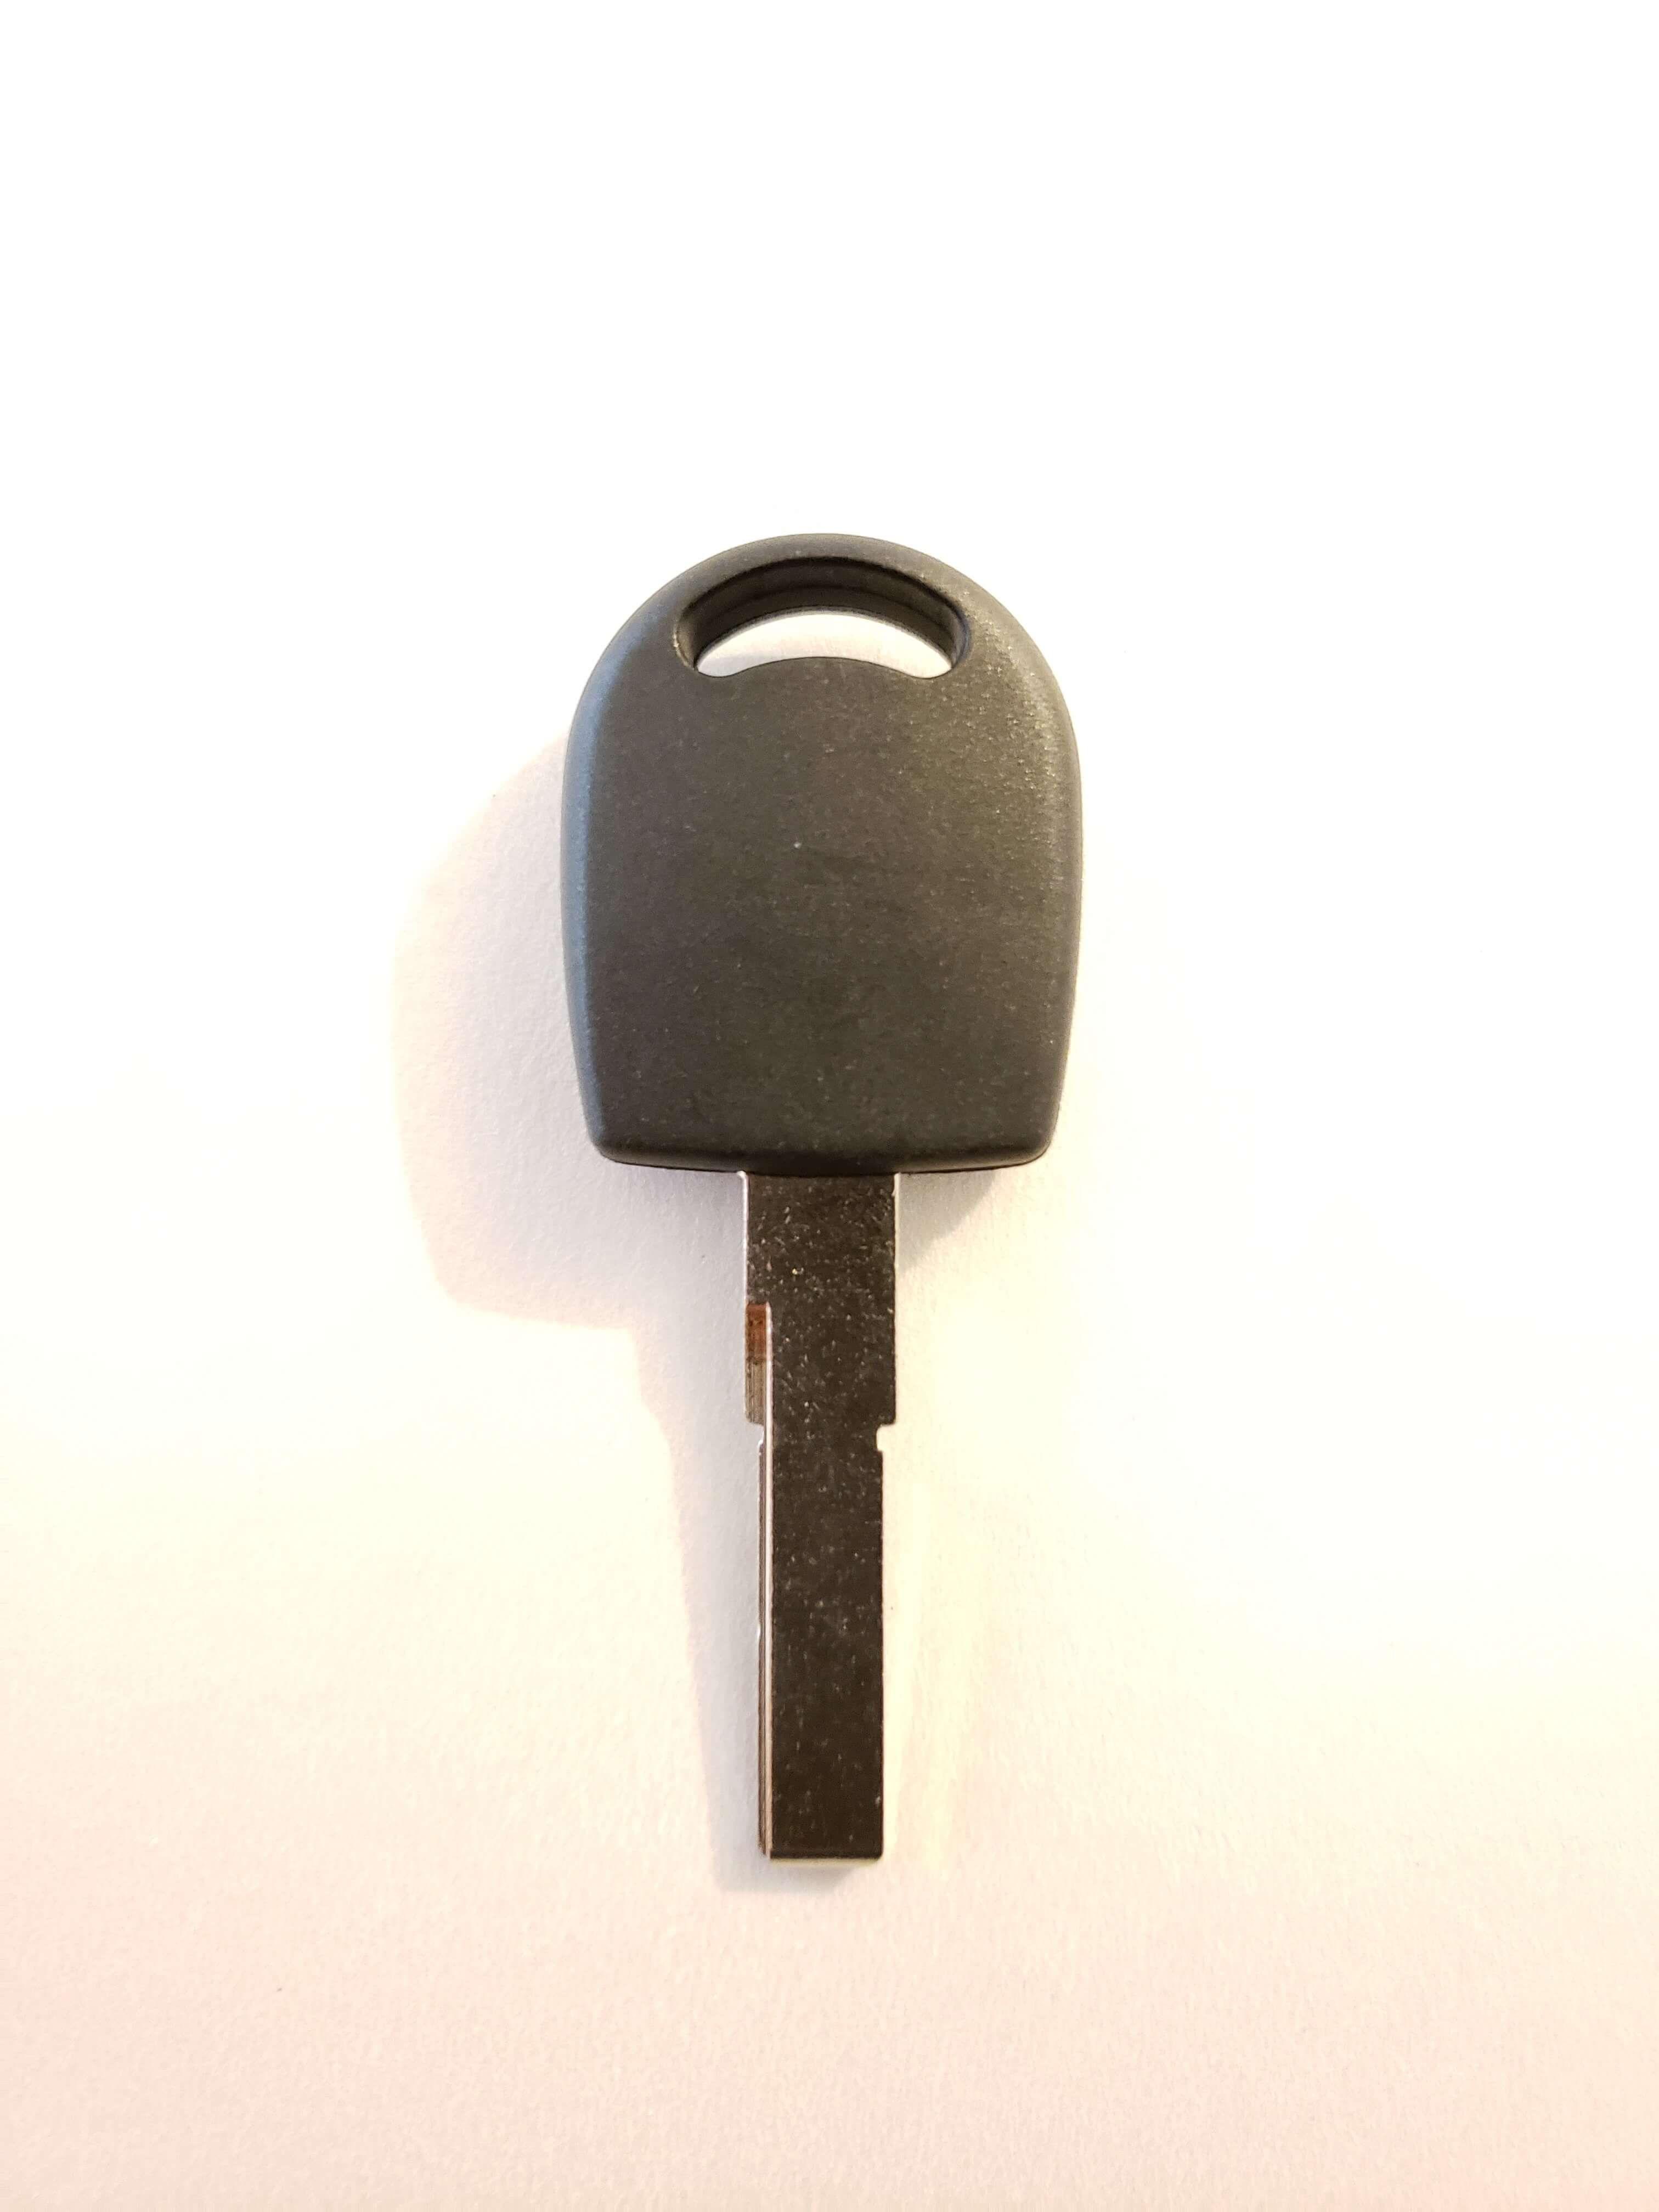 Volkswagen Phaeton Keys Replacement Car Key Replacement Lost Car Keys Key Replacement